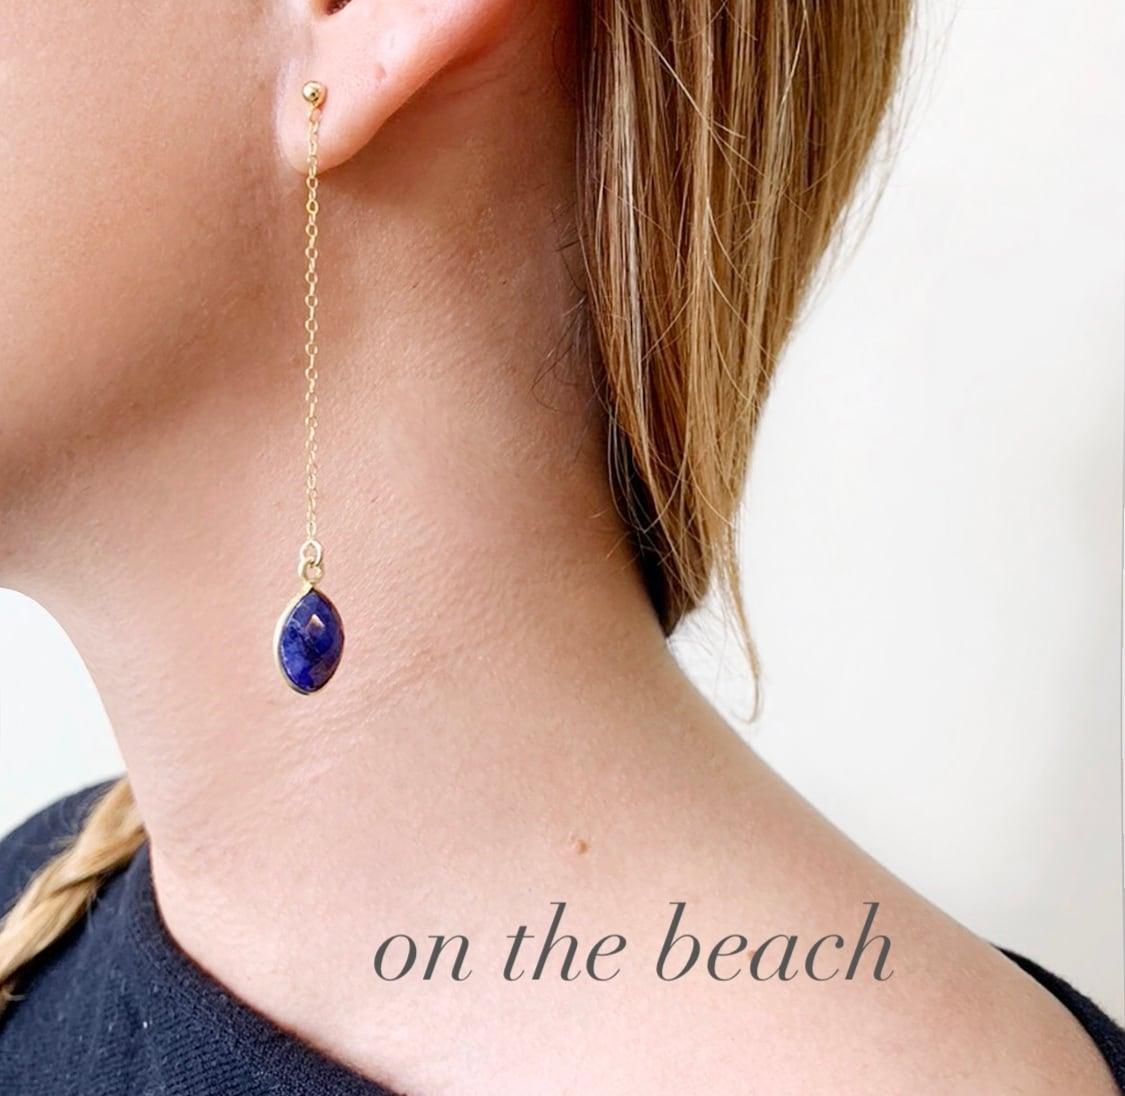 sapphire chain pierced earrings / OTB-71